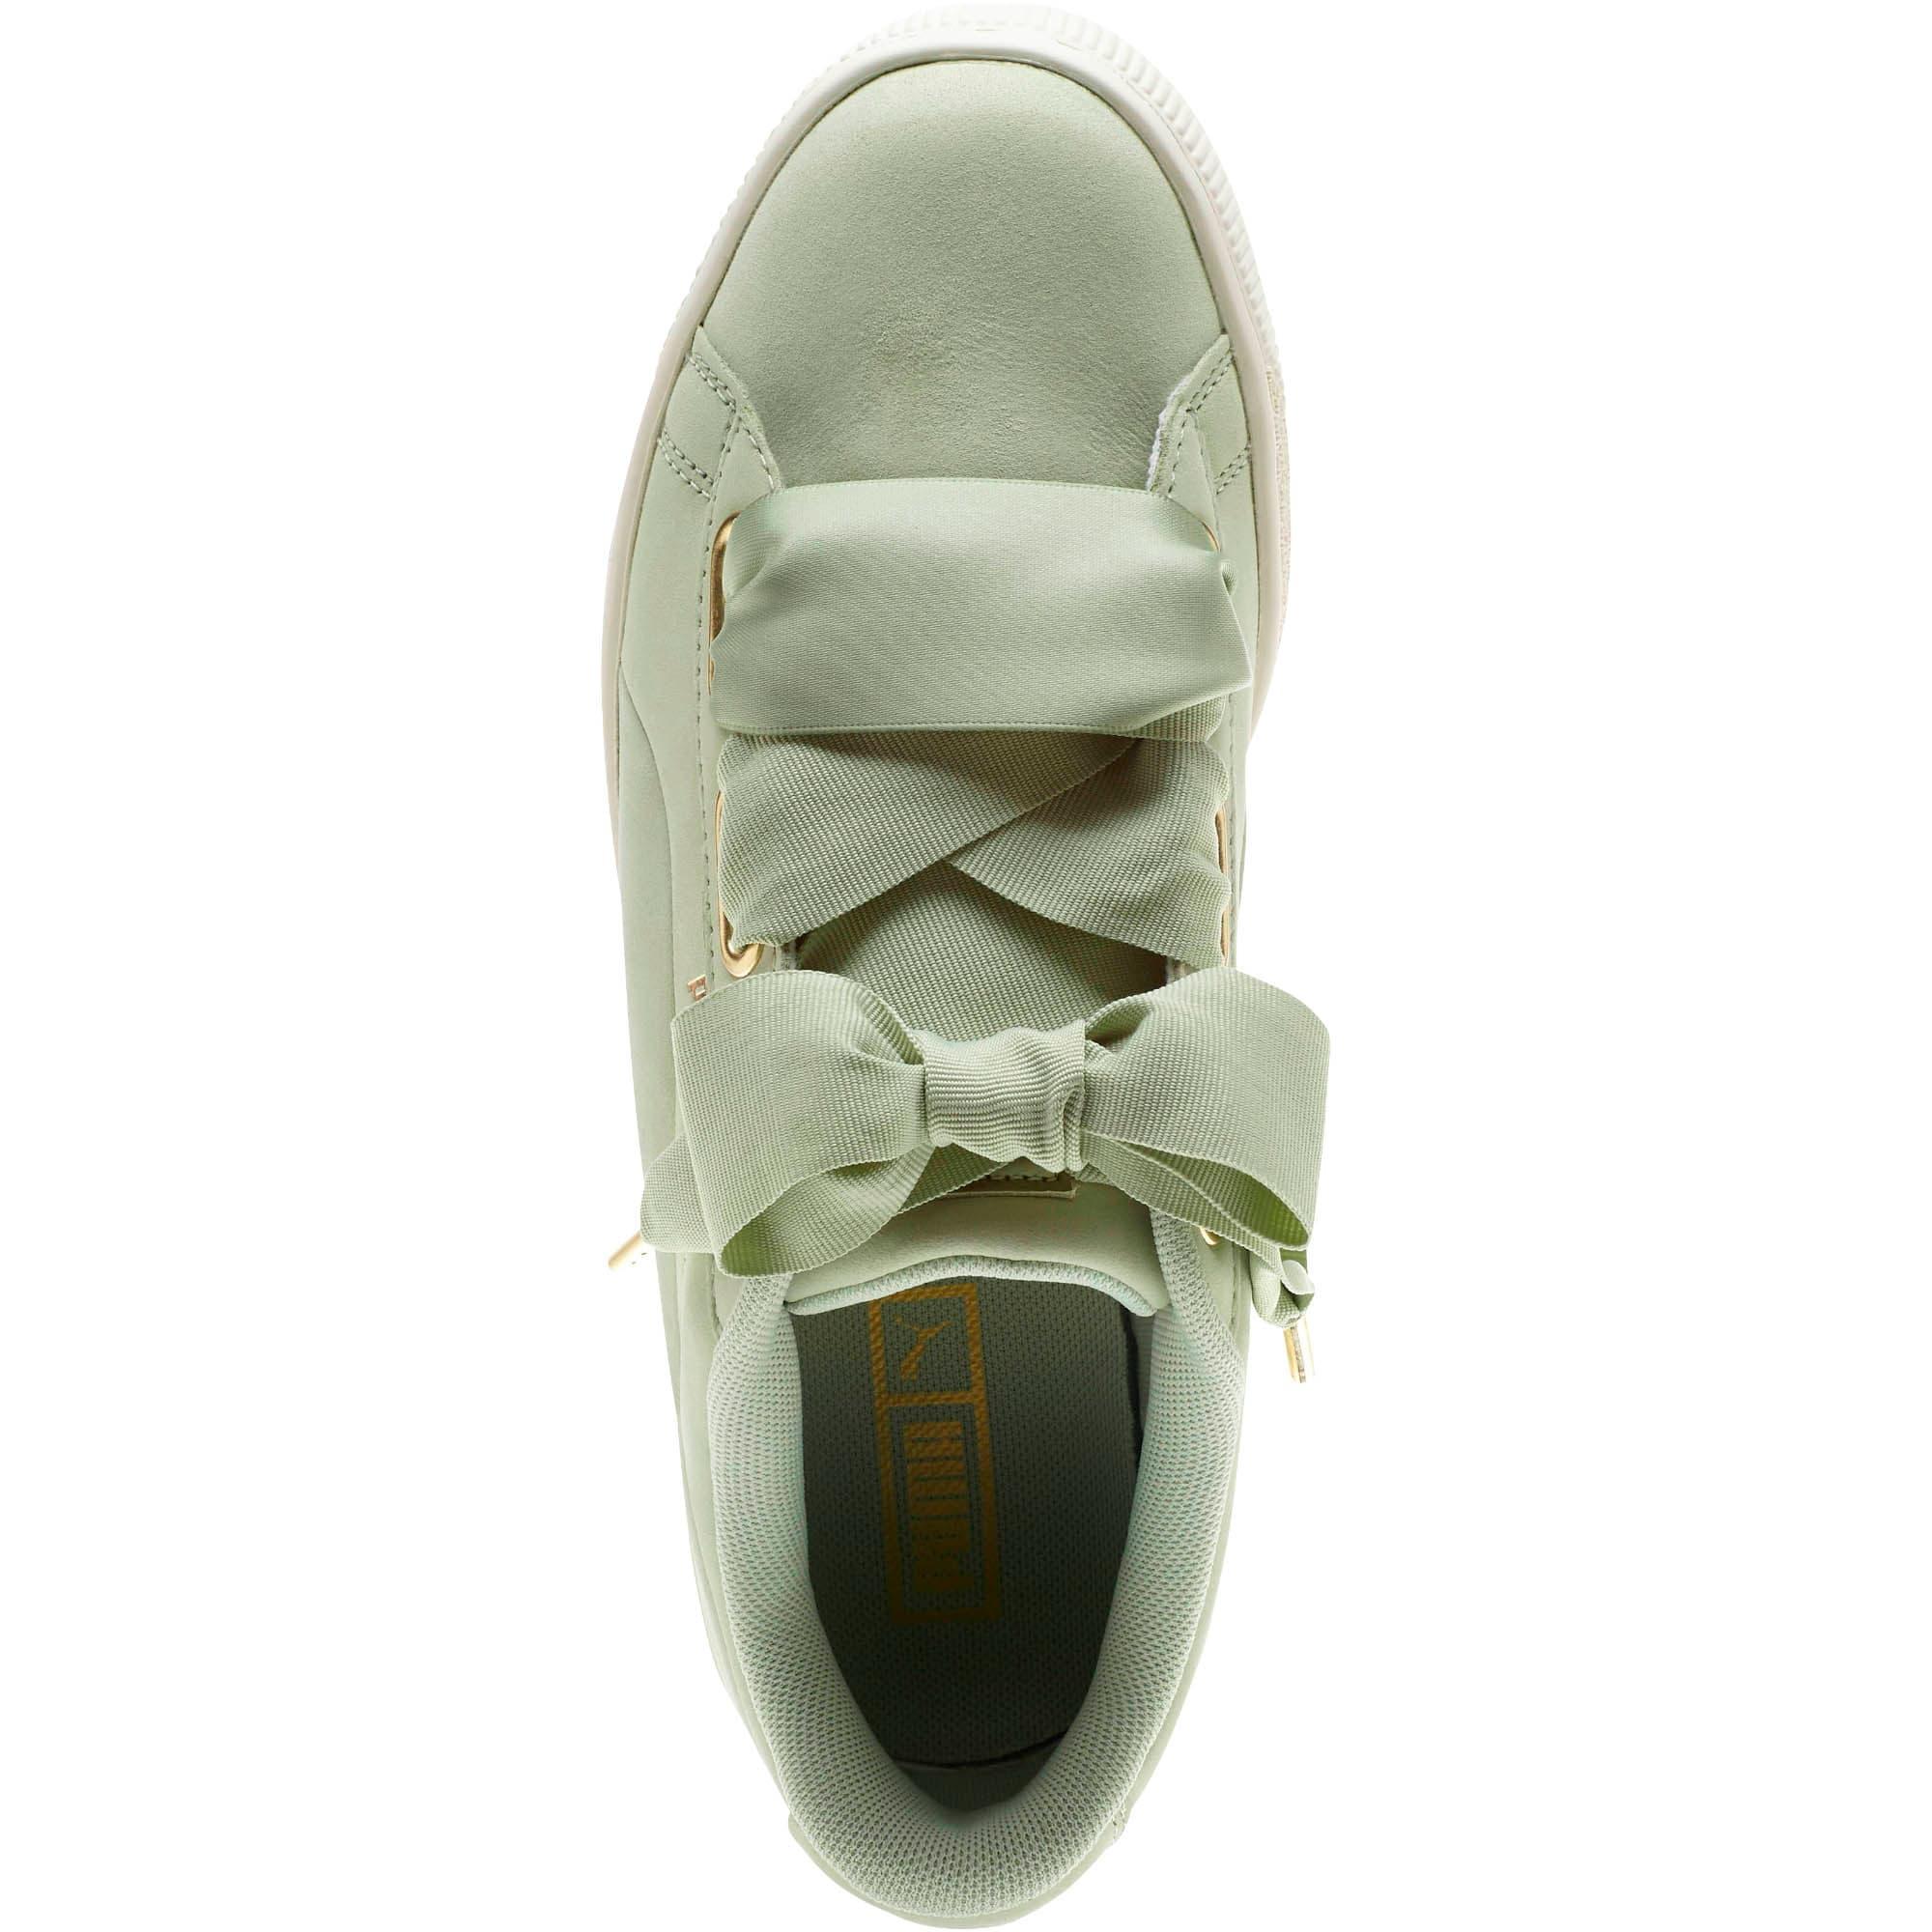 Thumbnail 5 of Basket Heart Soft Women's Sneakers, Smoke Green-Marshmallow, medium